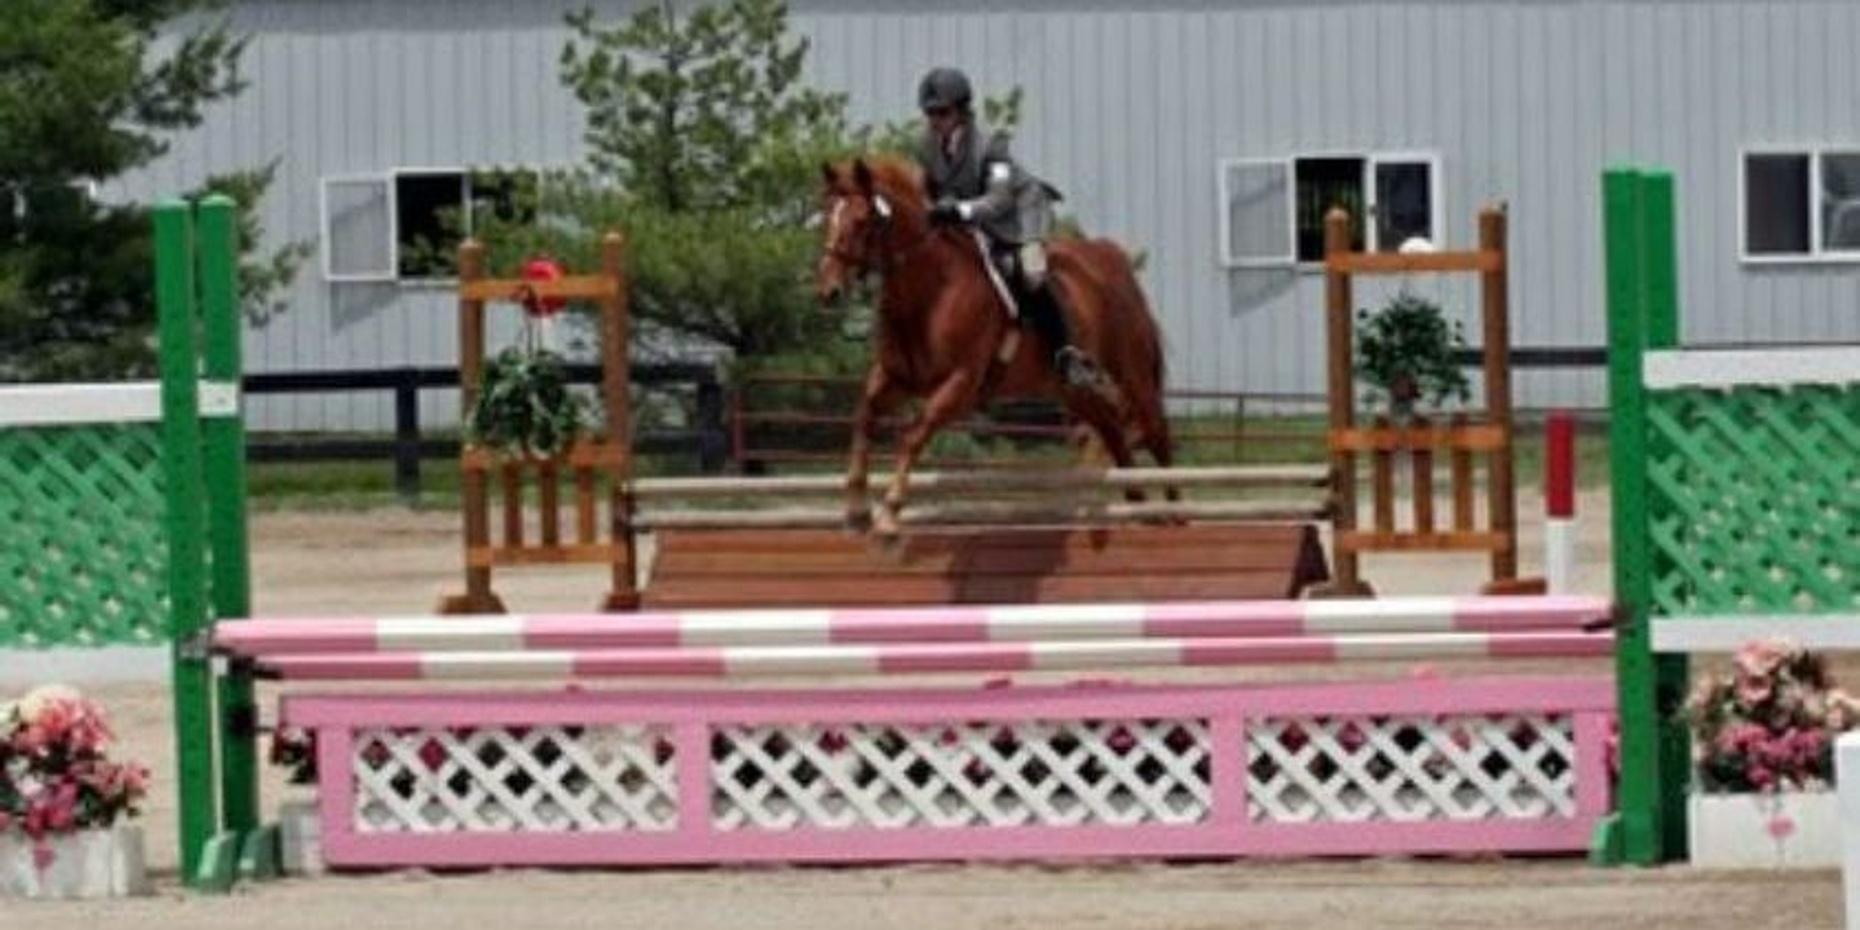 30-Minute Private Horseback Riding Lesson